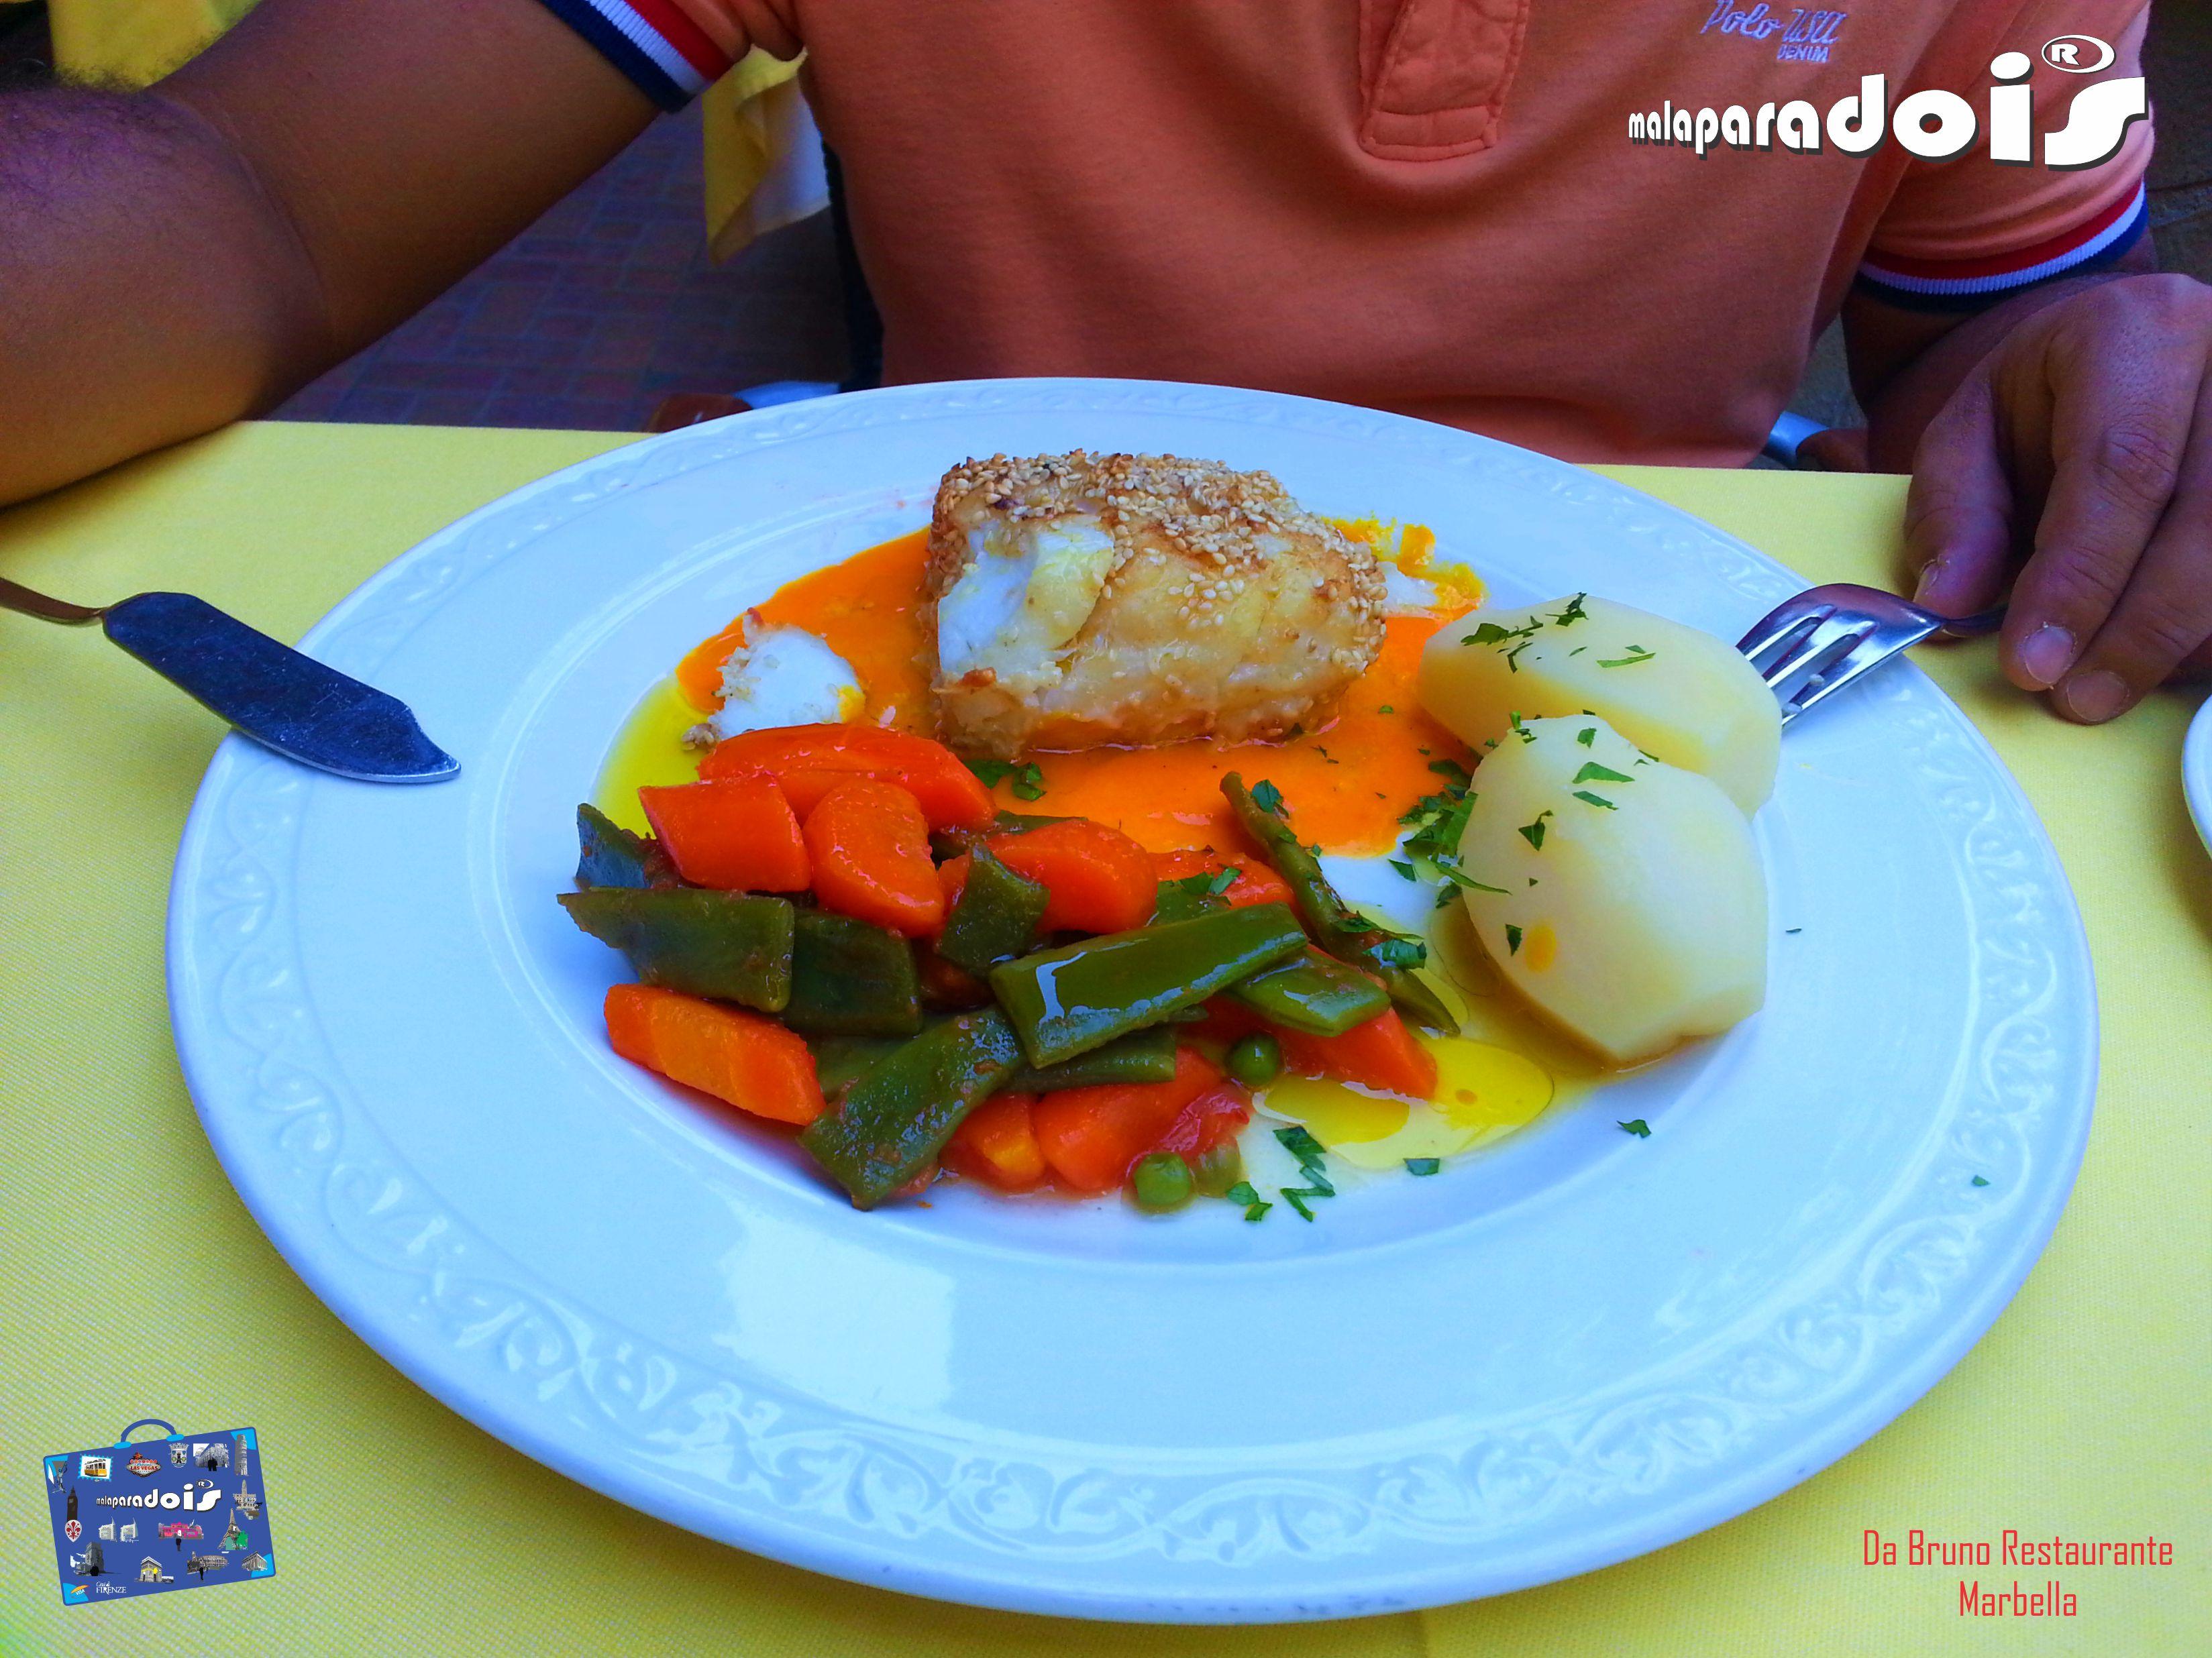 Da Bruno Restaurante